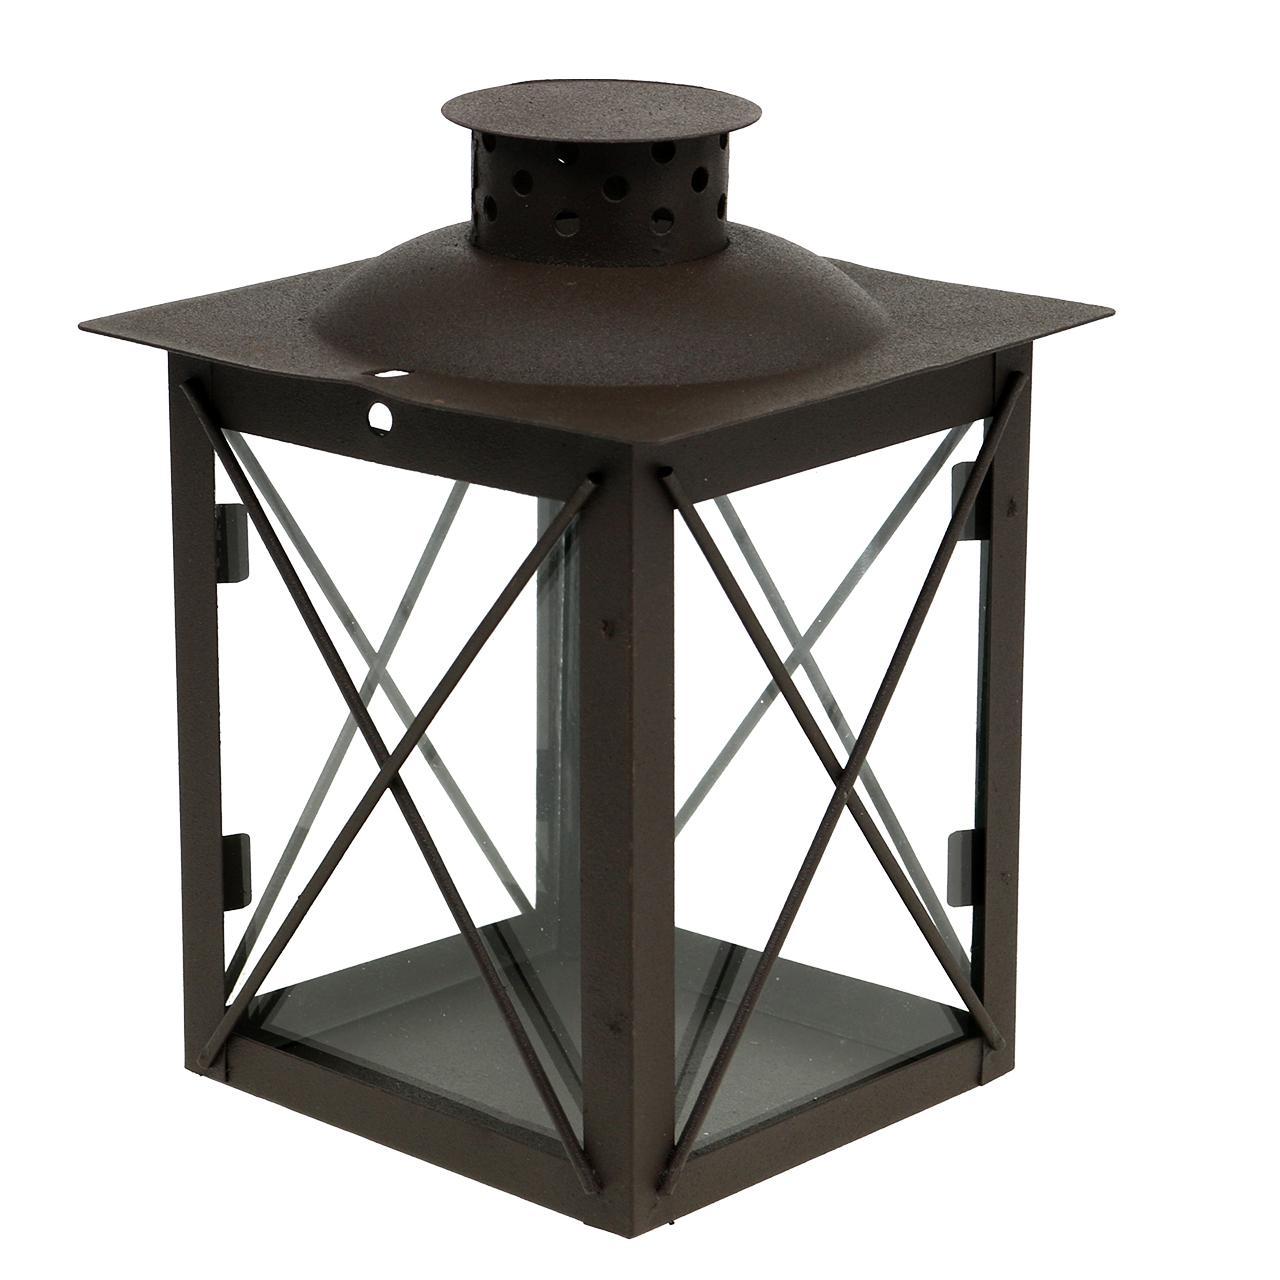 laterne aus metall rost 12cm x12cm h13cm preiswert online kaufen. Black Bedroom Furniture Sets. Home Design Ideas